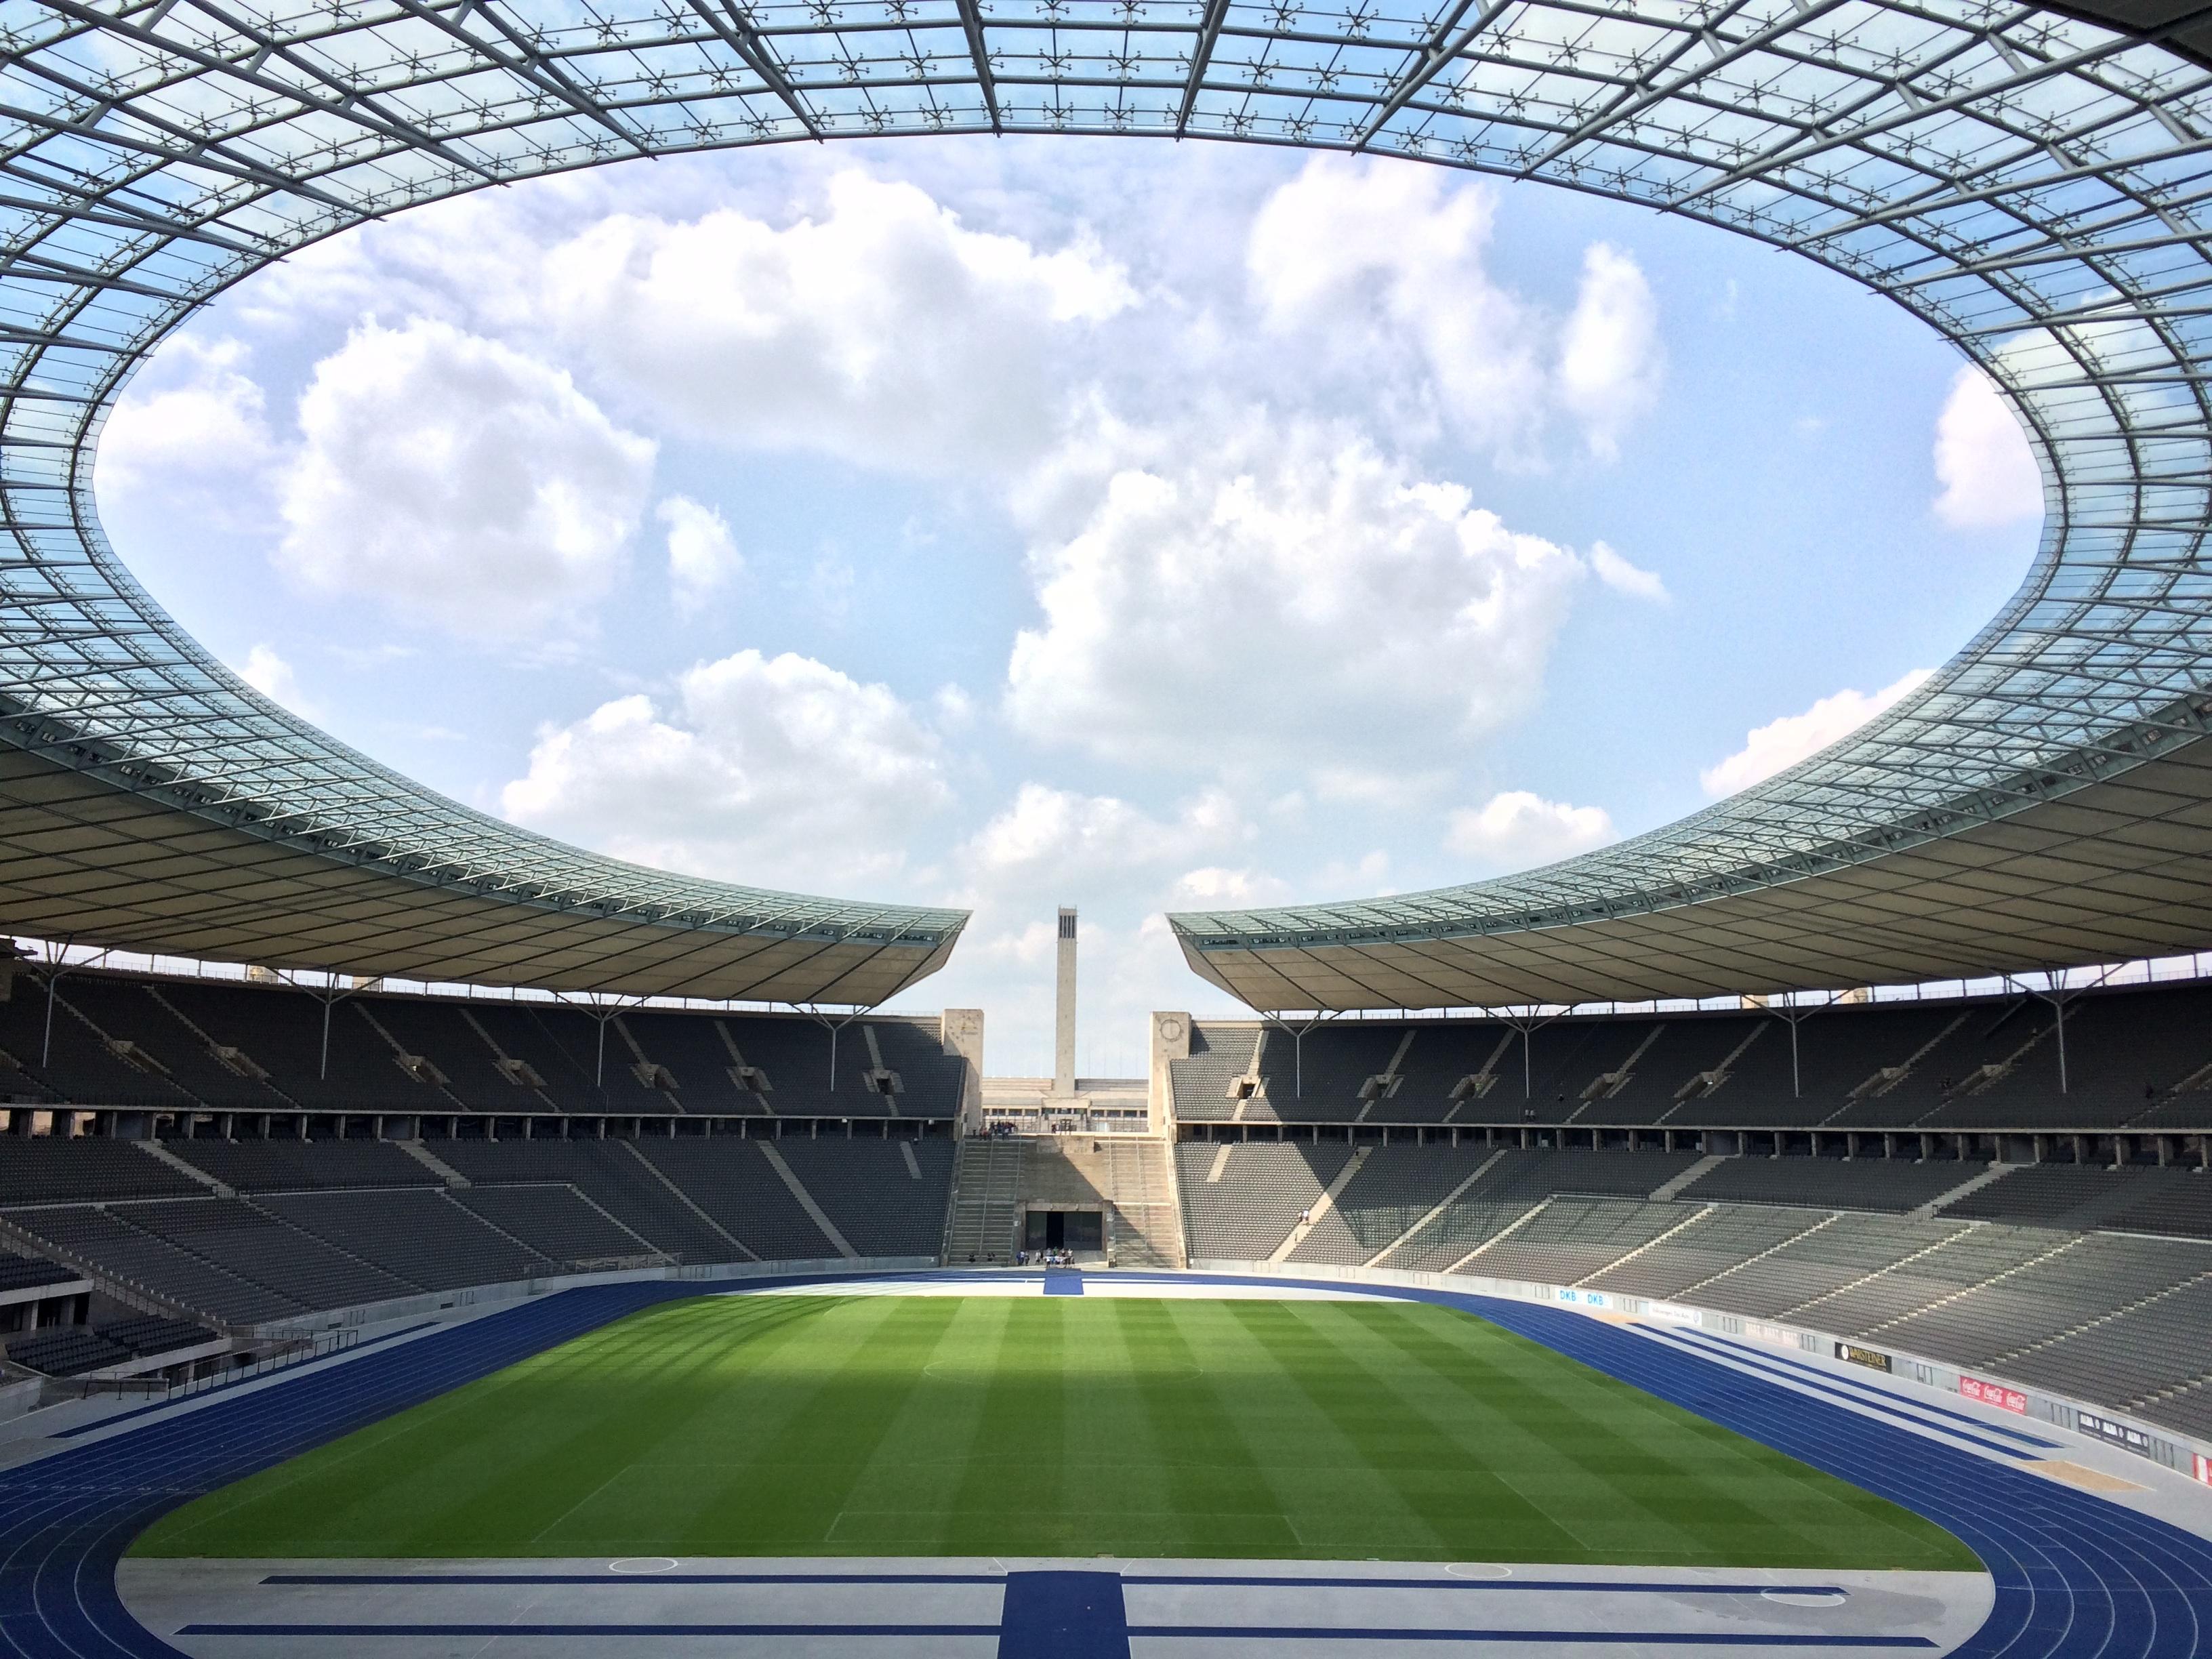 Картинки со стадионами